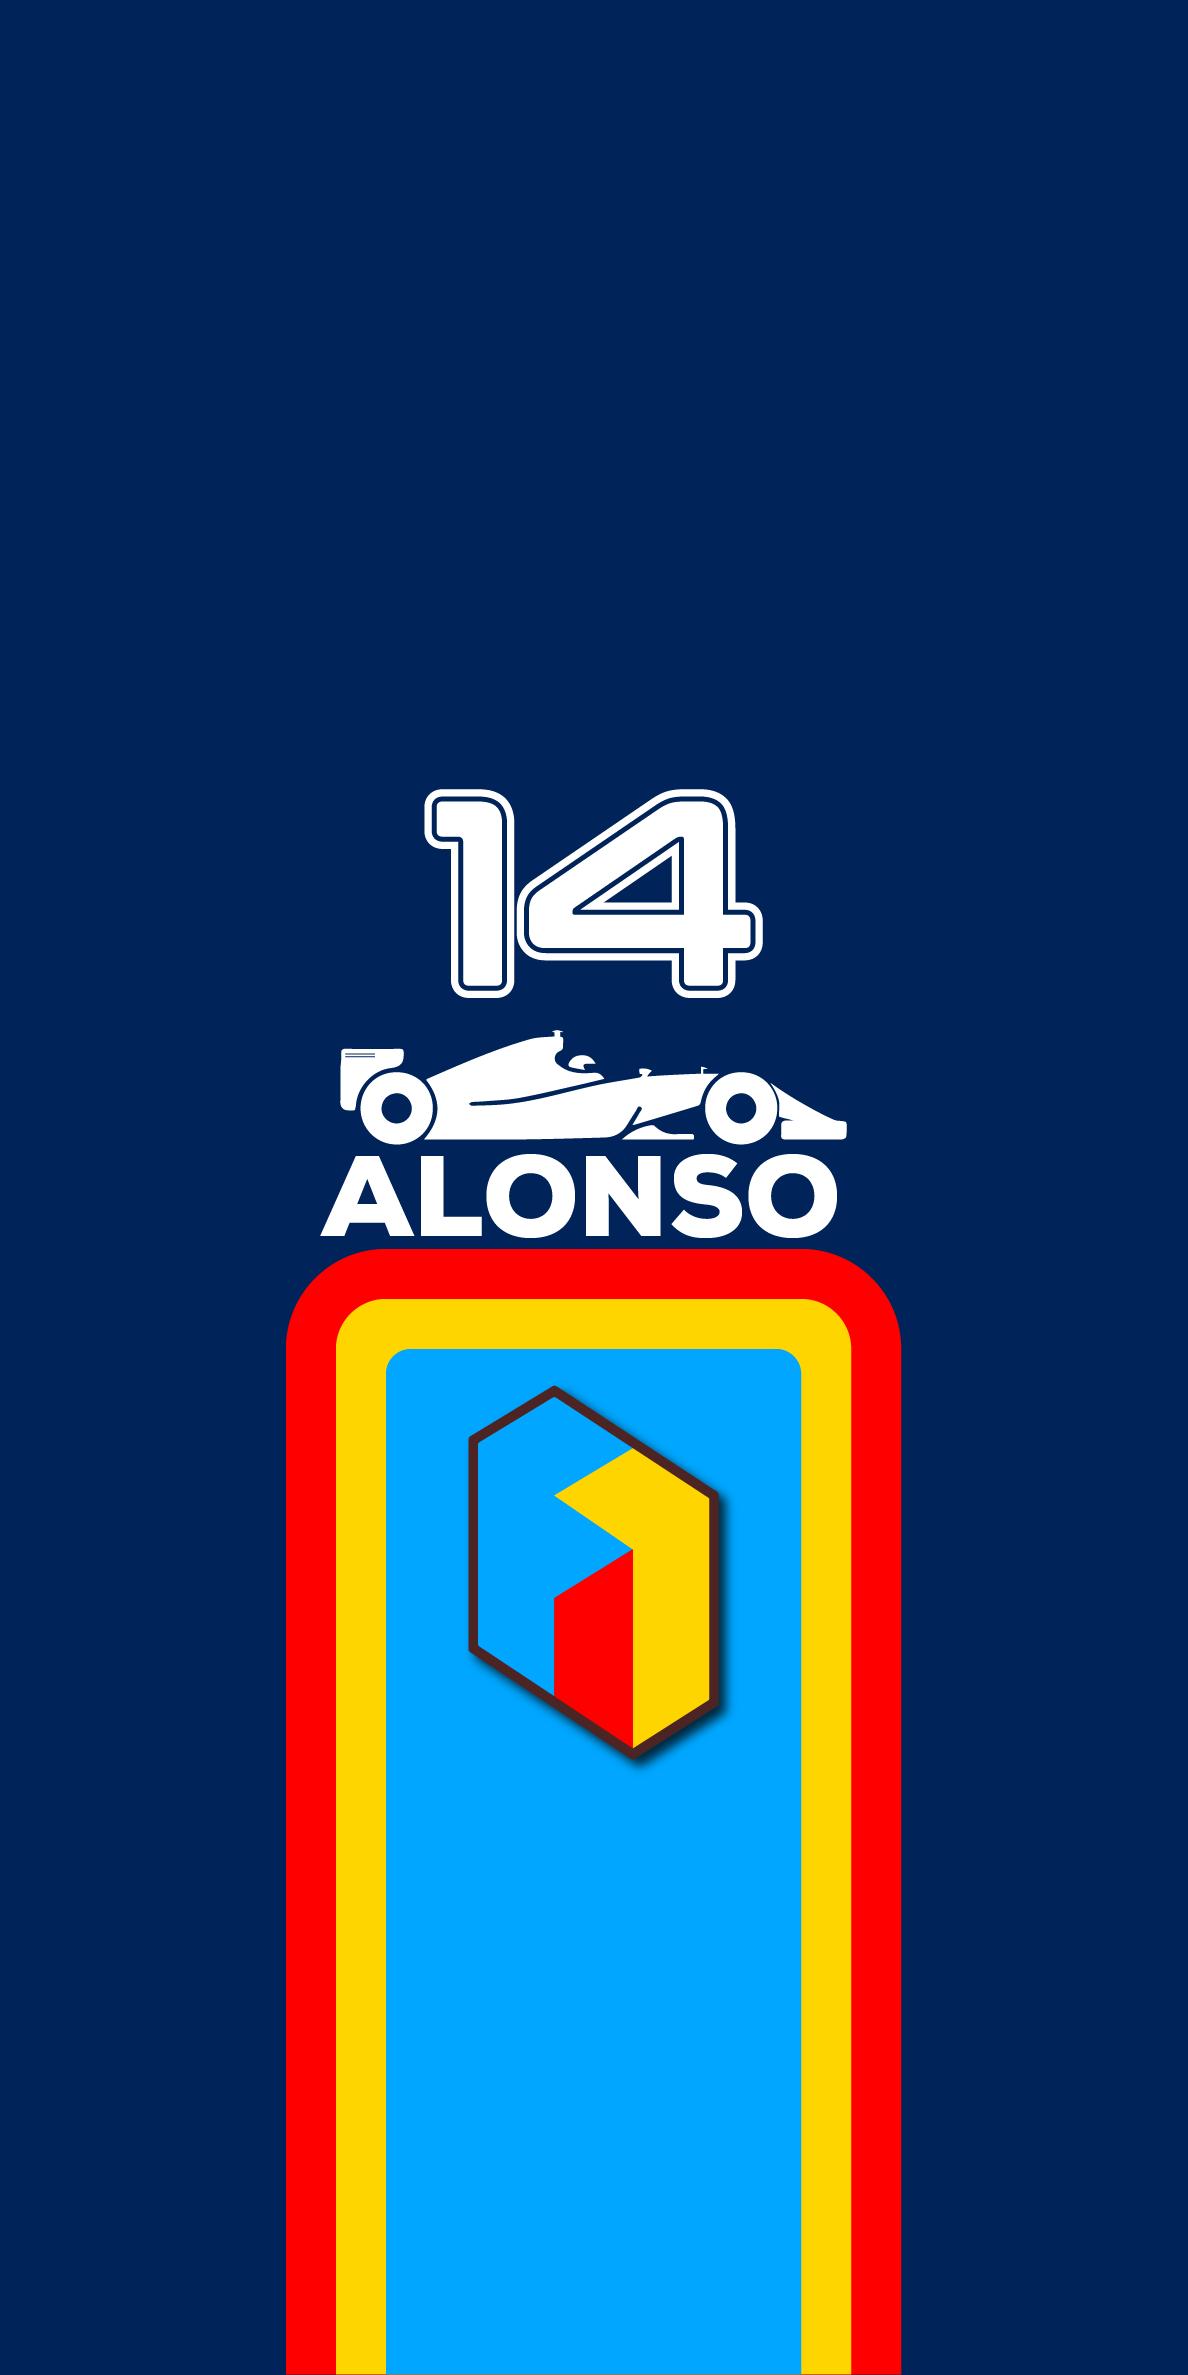 fernandoalonso fa14 f1 formula1 racing spanish motorsport 1188x2375